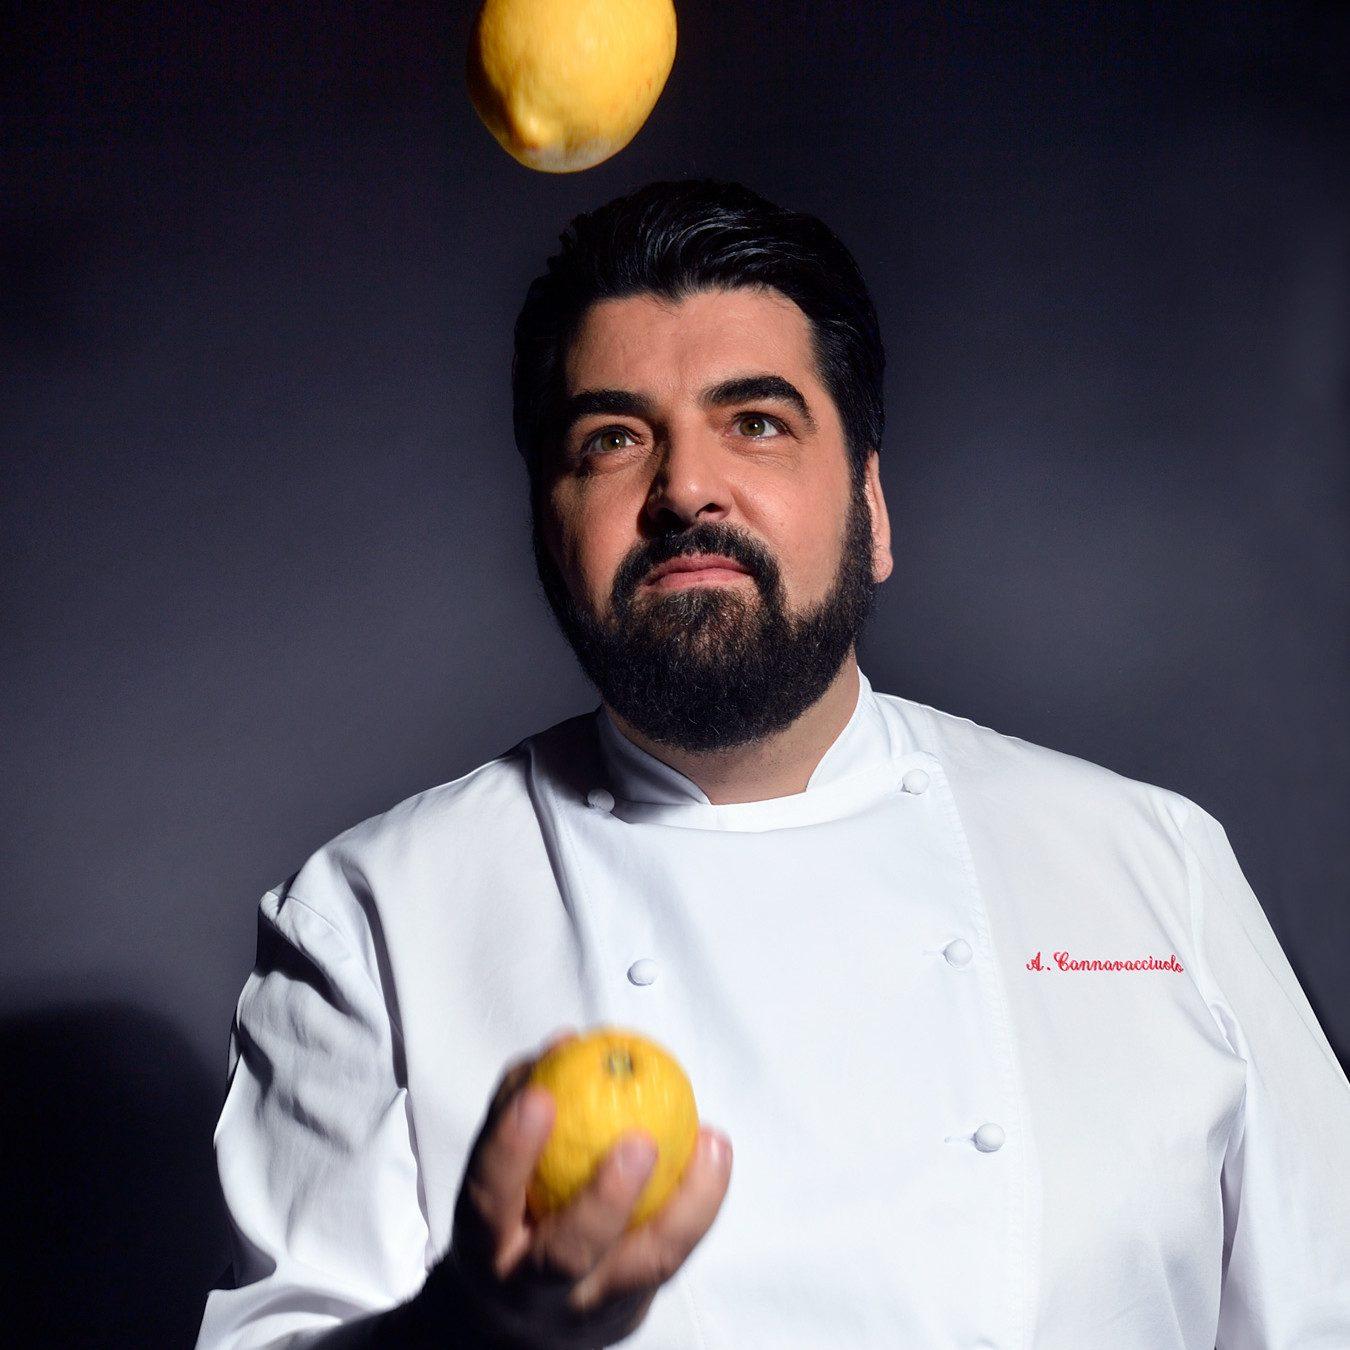 chef-1-uai-1350x1350